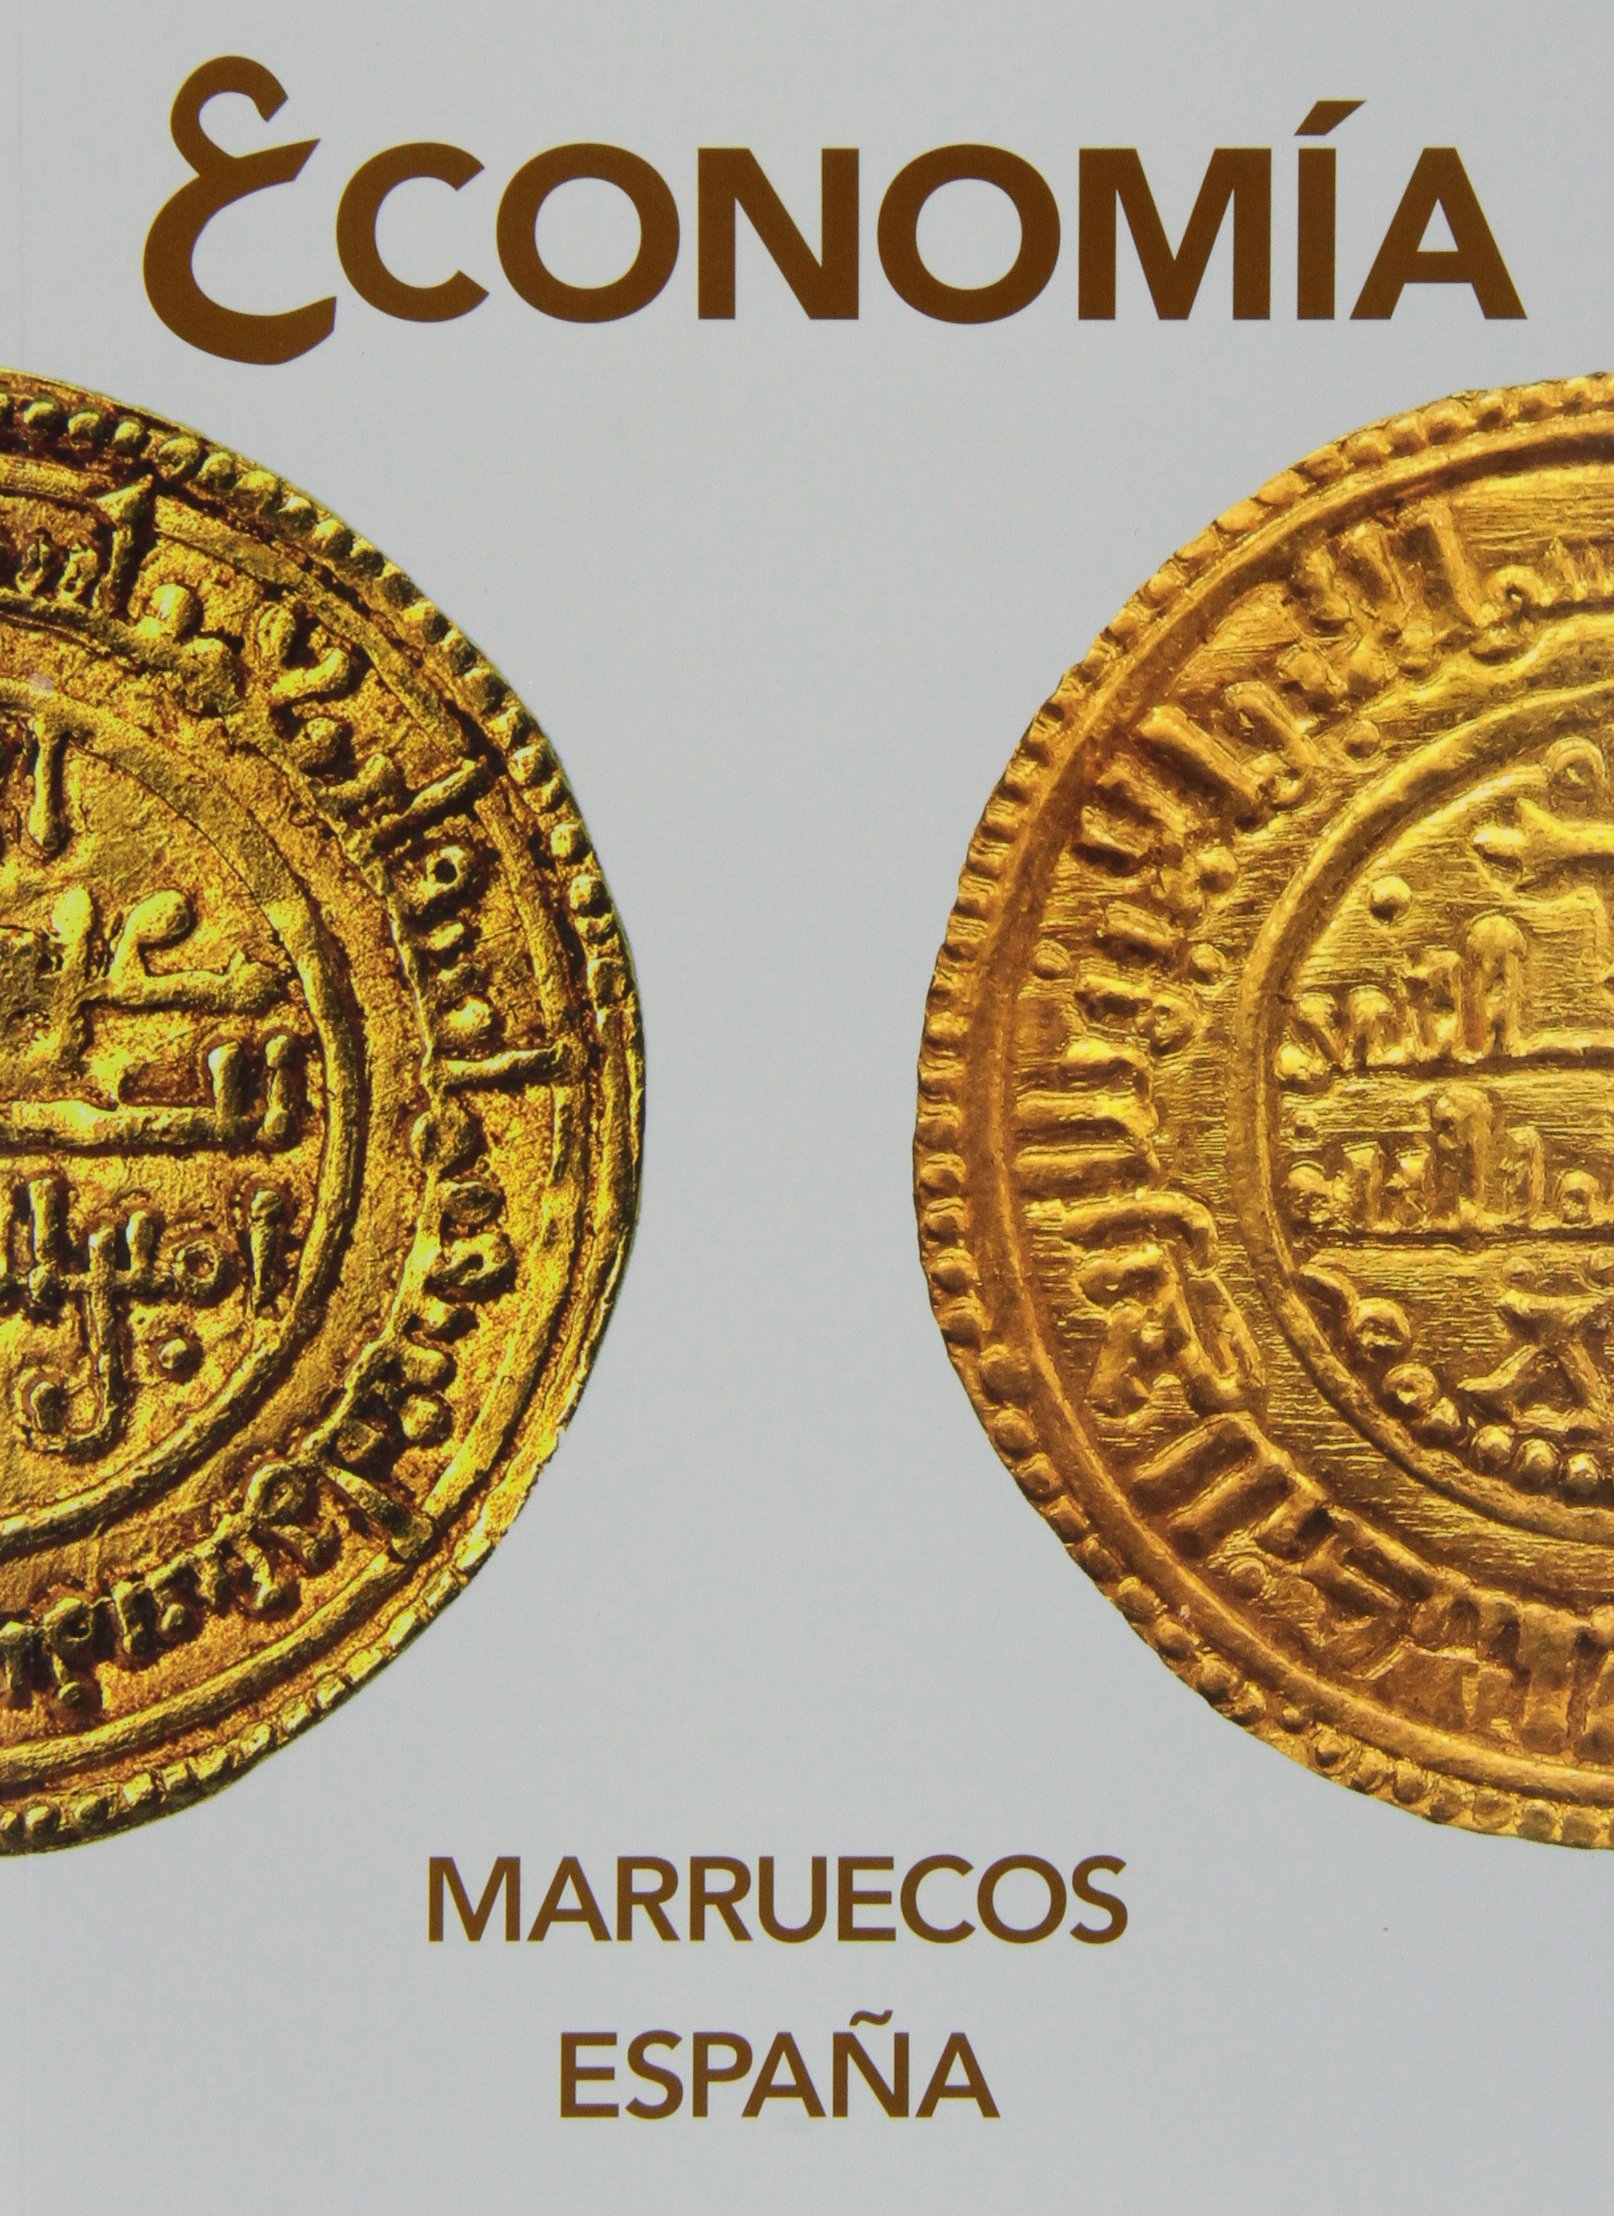 Economía España Marruecos: Amazon.es: Vv.Aa.: Libros